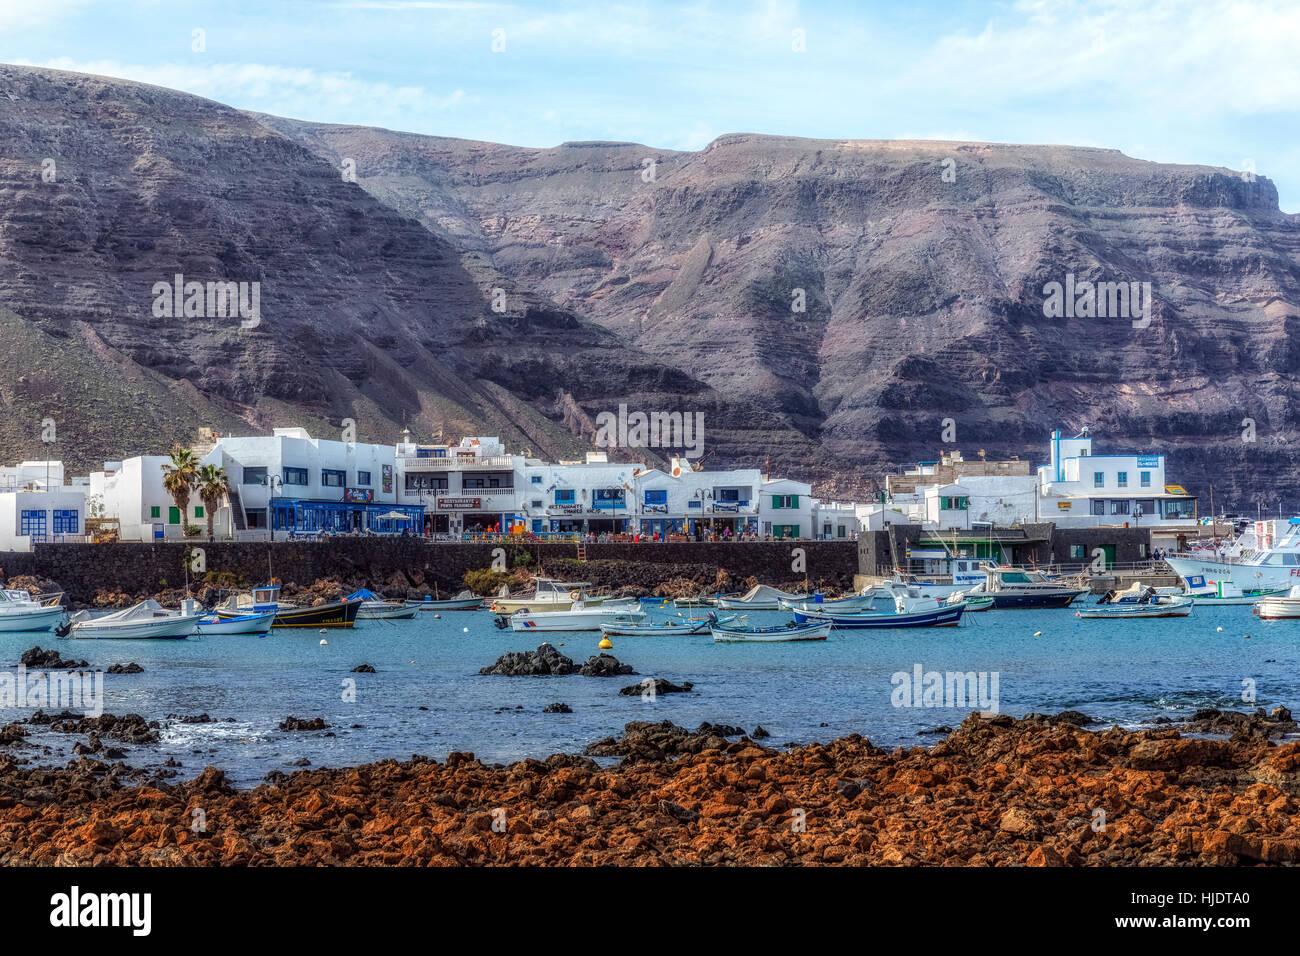 Orzola, Haria, Lanzarote, Kanarische Inseln, Spanien Stockfoto